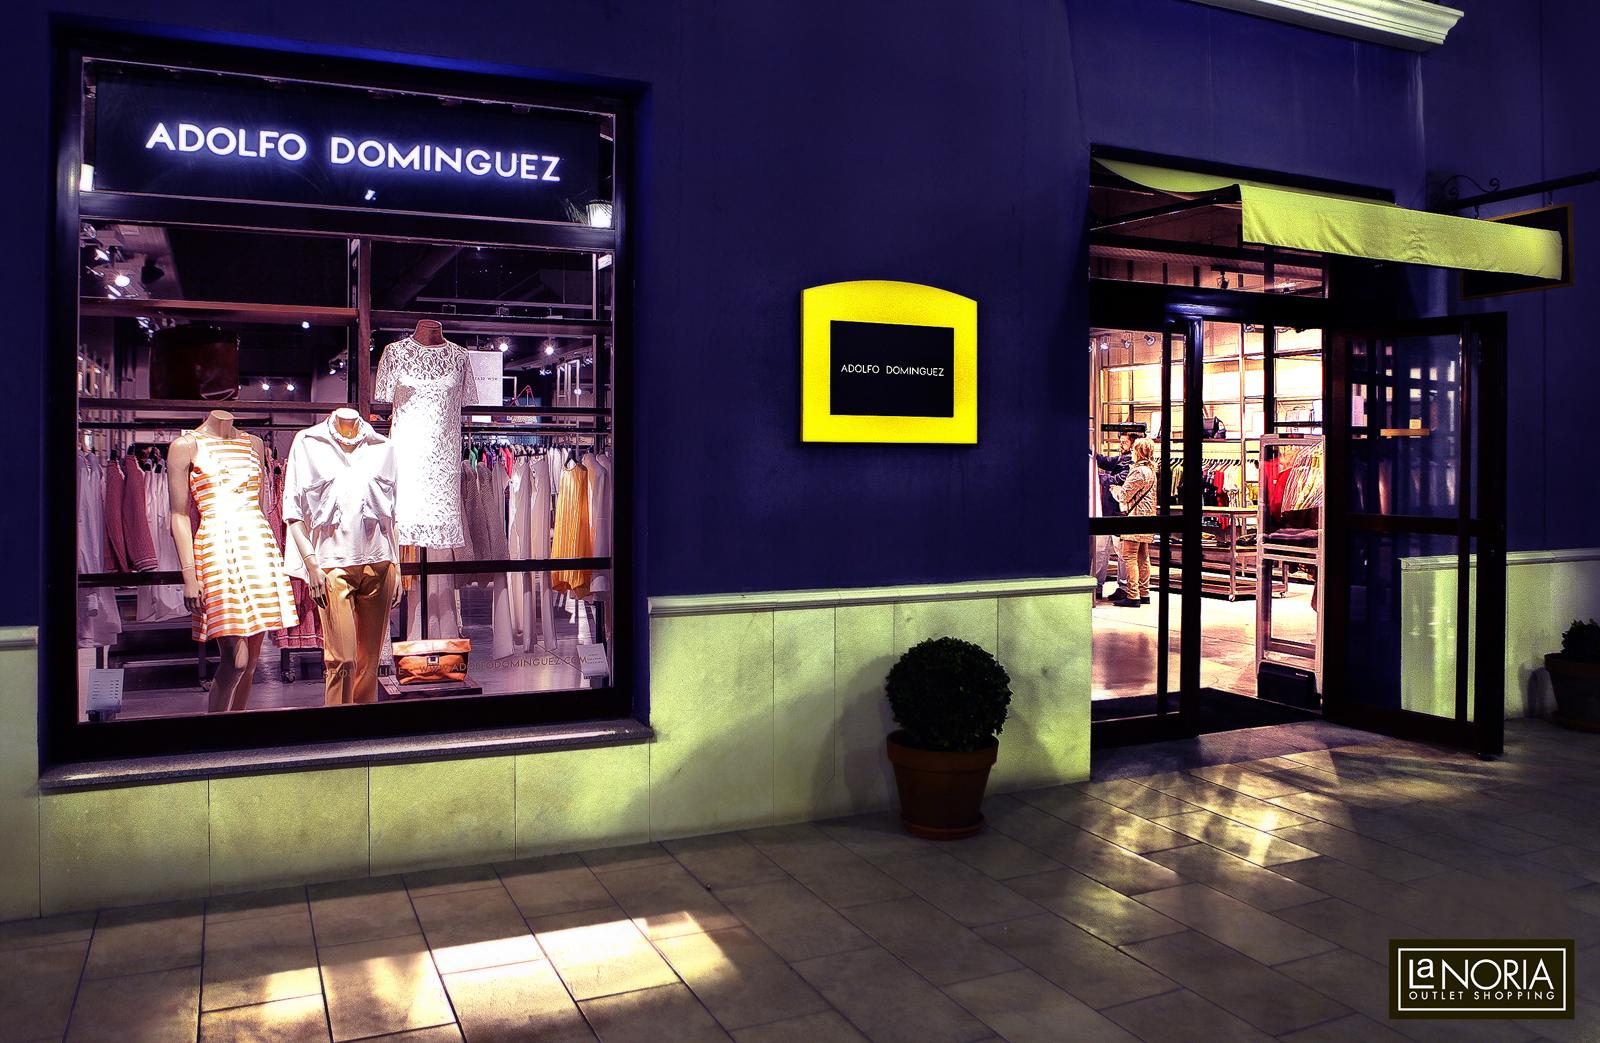 Adolfo dom nguez outlet en murcia centro comercial la noria for Adolfo dominguez badajoz